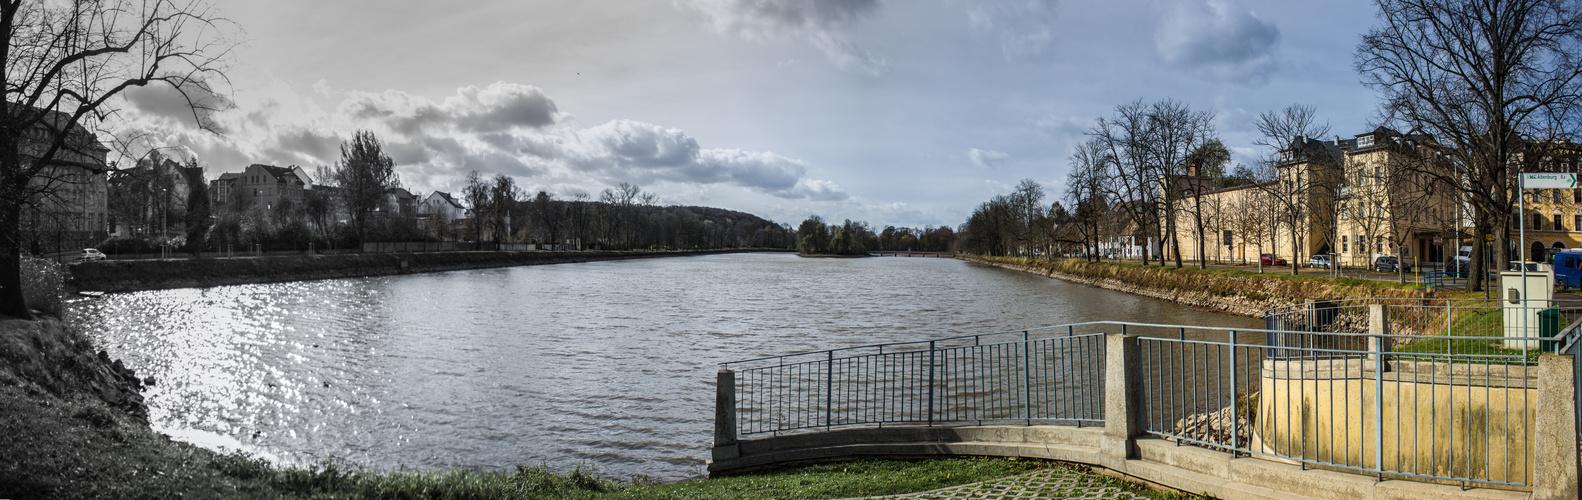 Fototour am Großen Teich in Abg